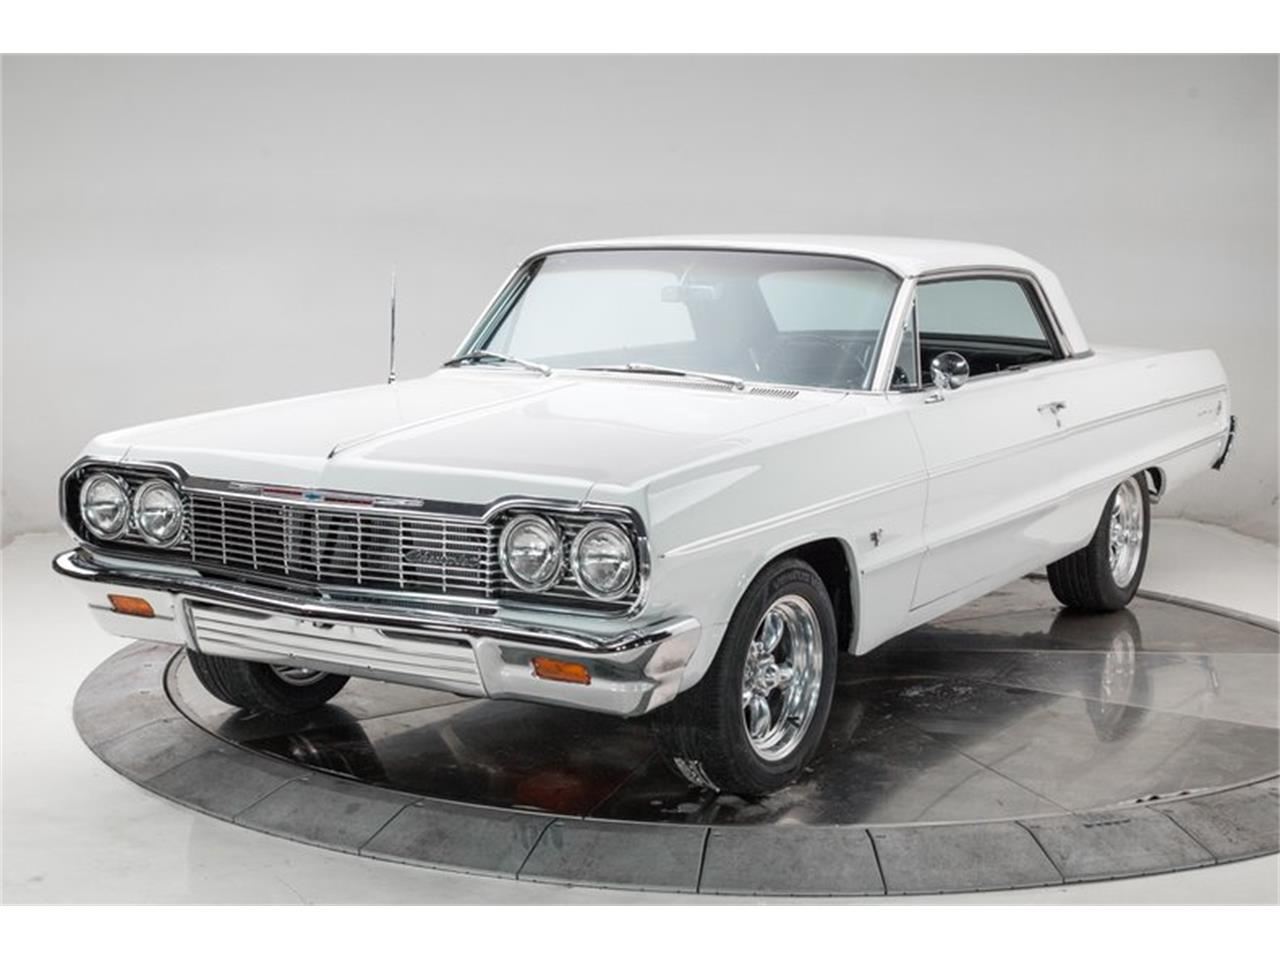 Miraculous 1964 Chevrolet Impala For Sale Classiccars Com Cc 1193372 Short Links Chair Design For Home Short Linksinfo